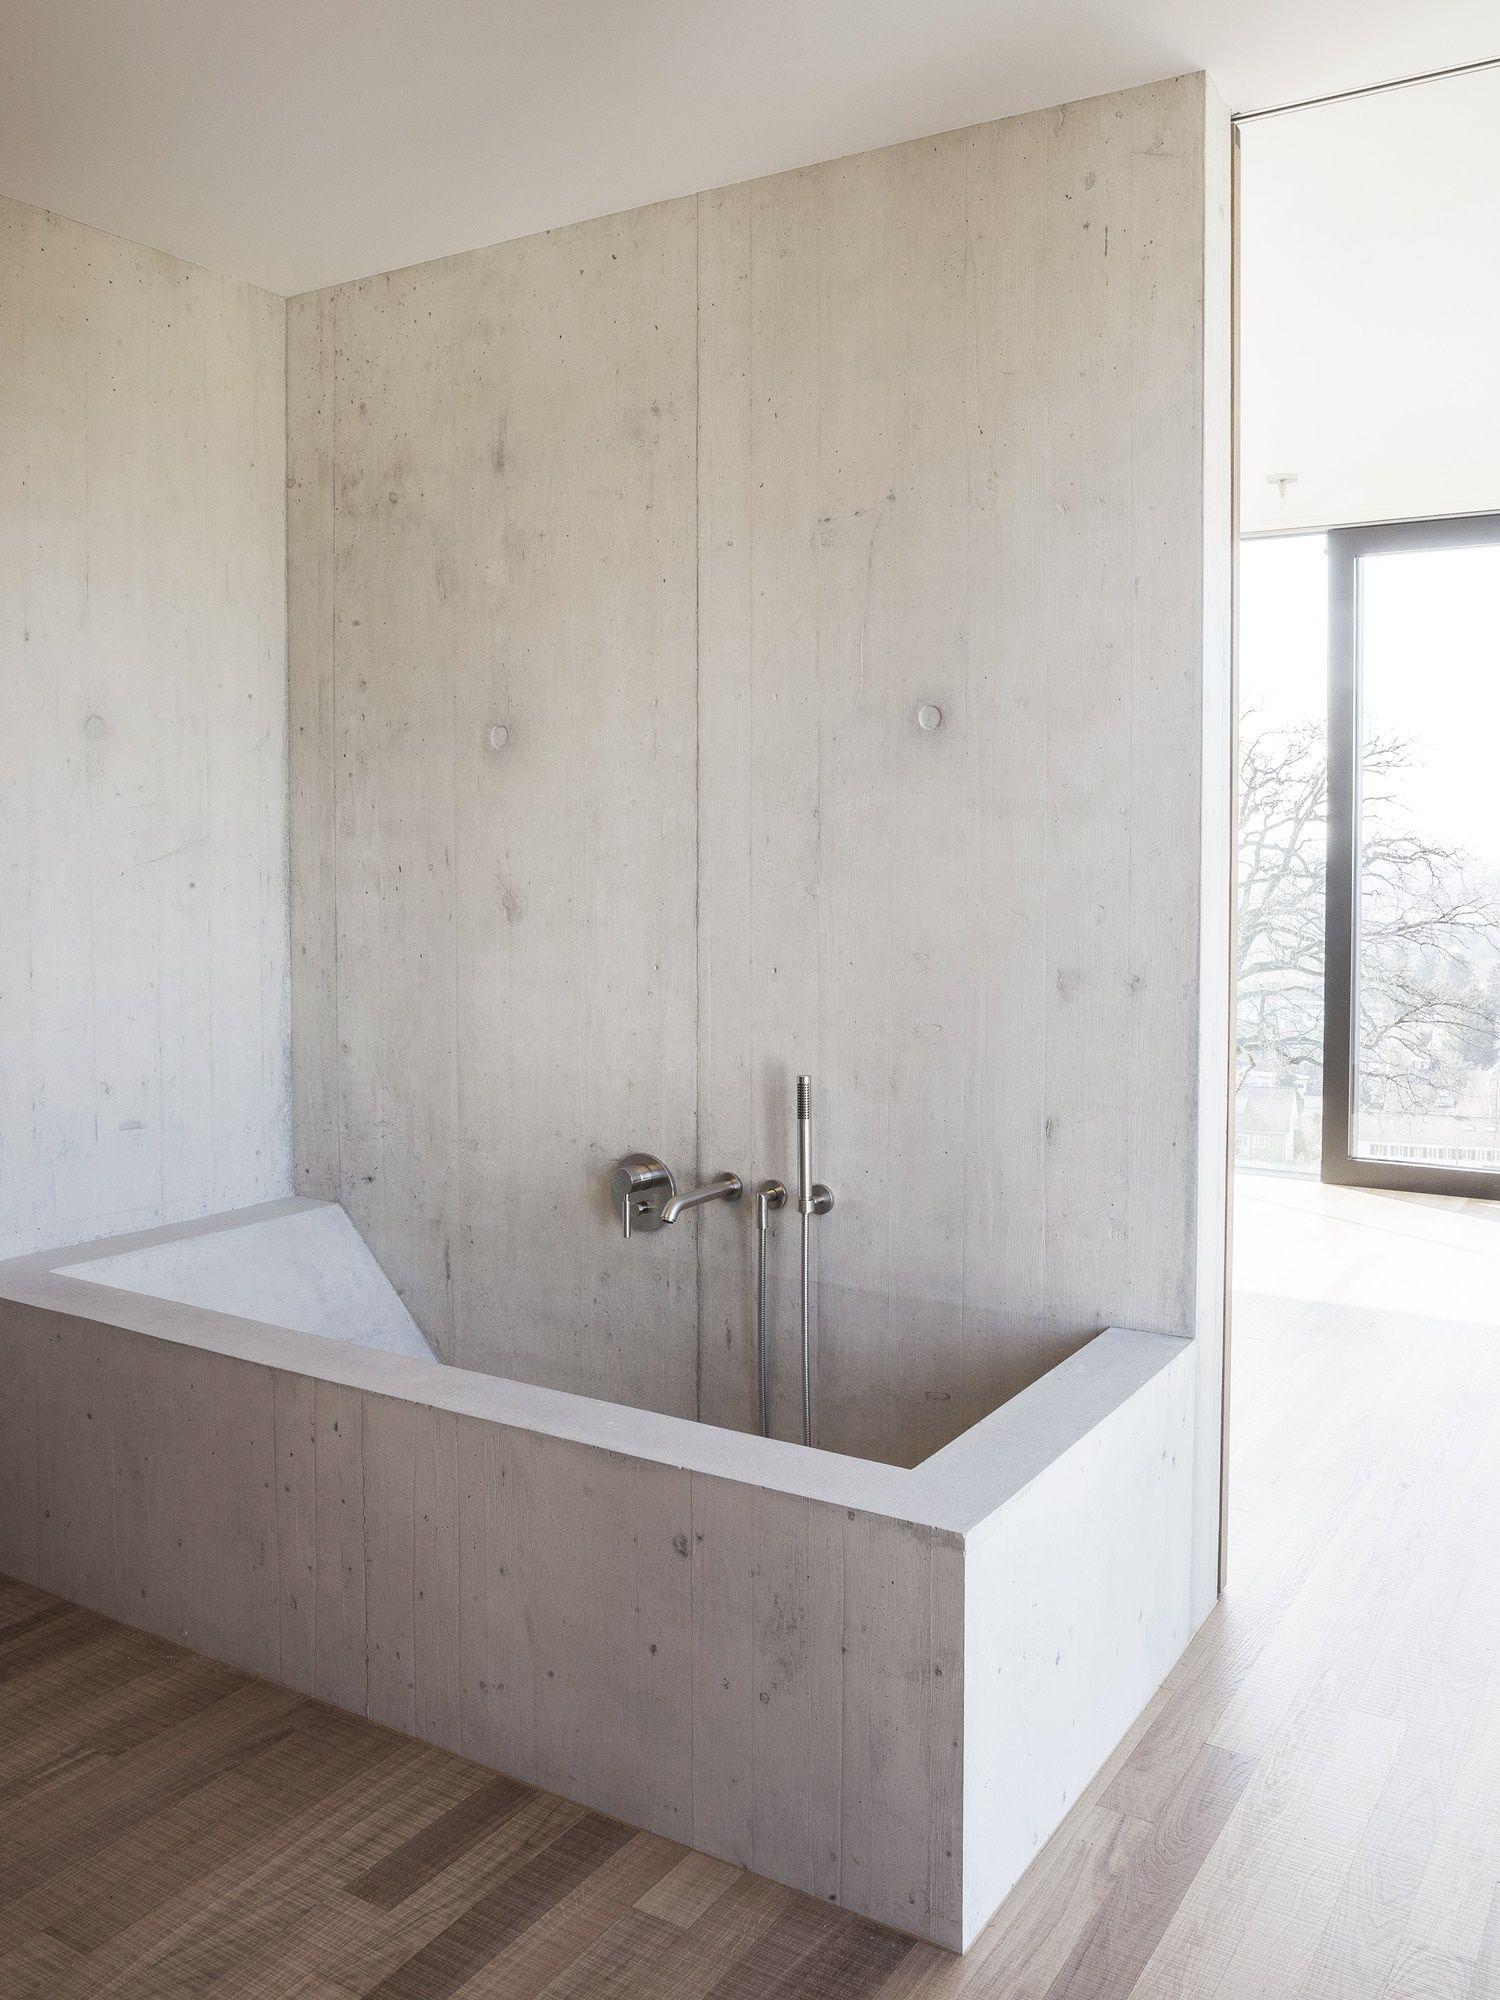 2018 Design Trends for the Bathroom | Design trends, Concrete and Bath